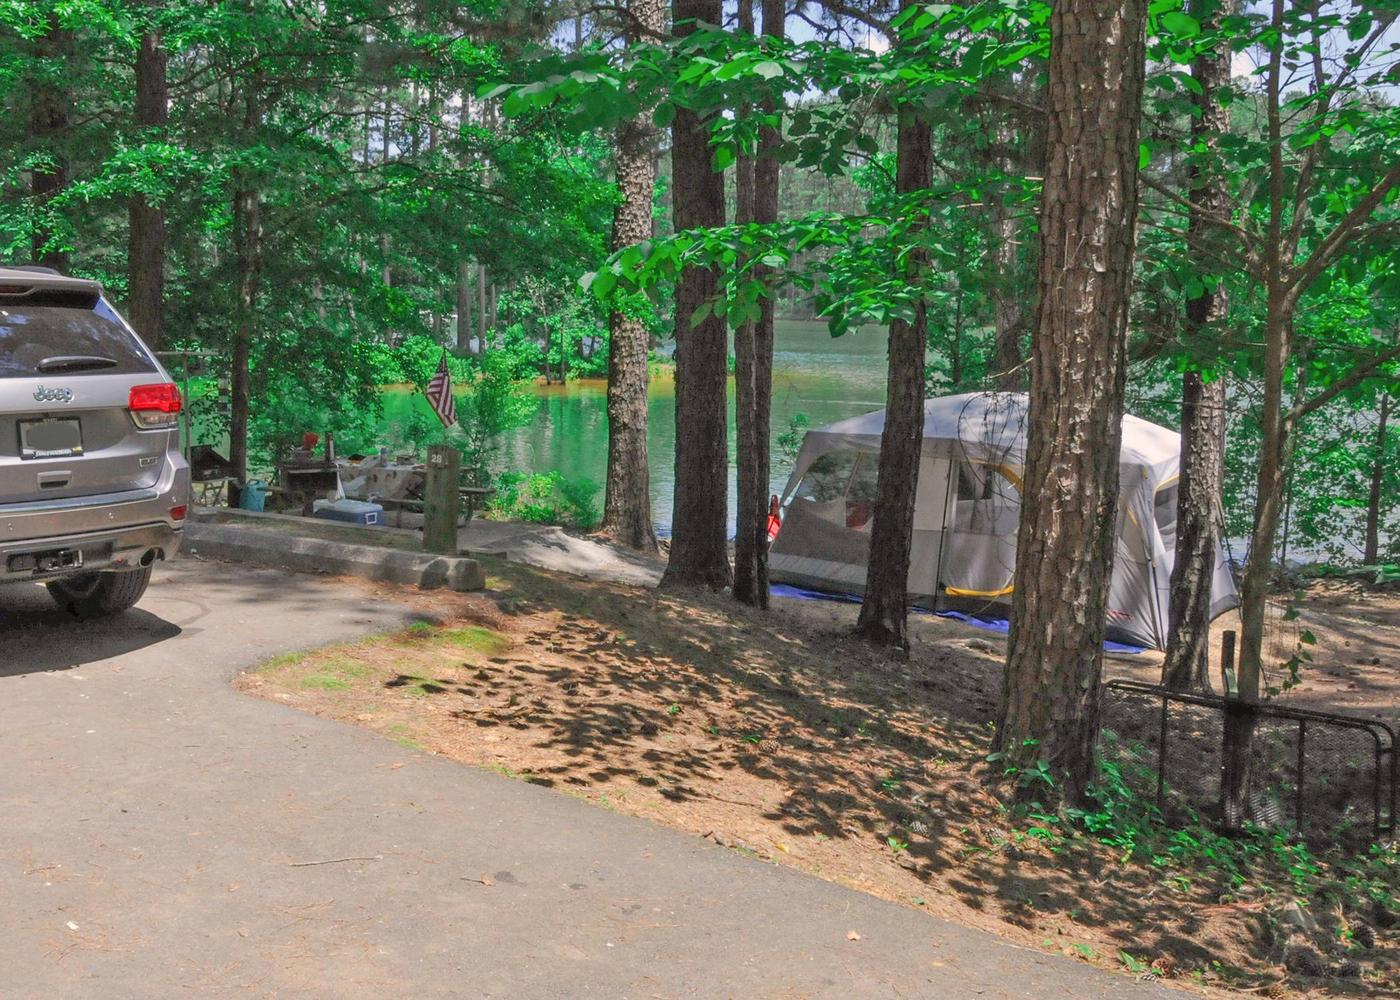 Campsite view.McKaskey Creek Campground, campsite 28.